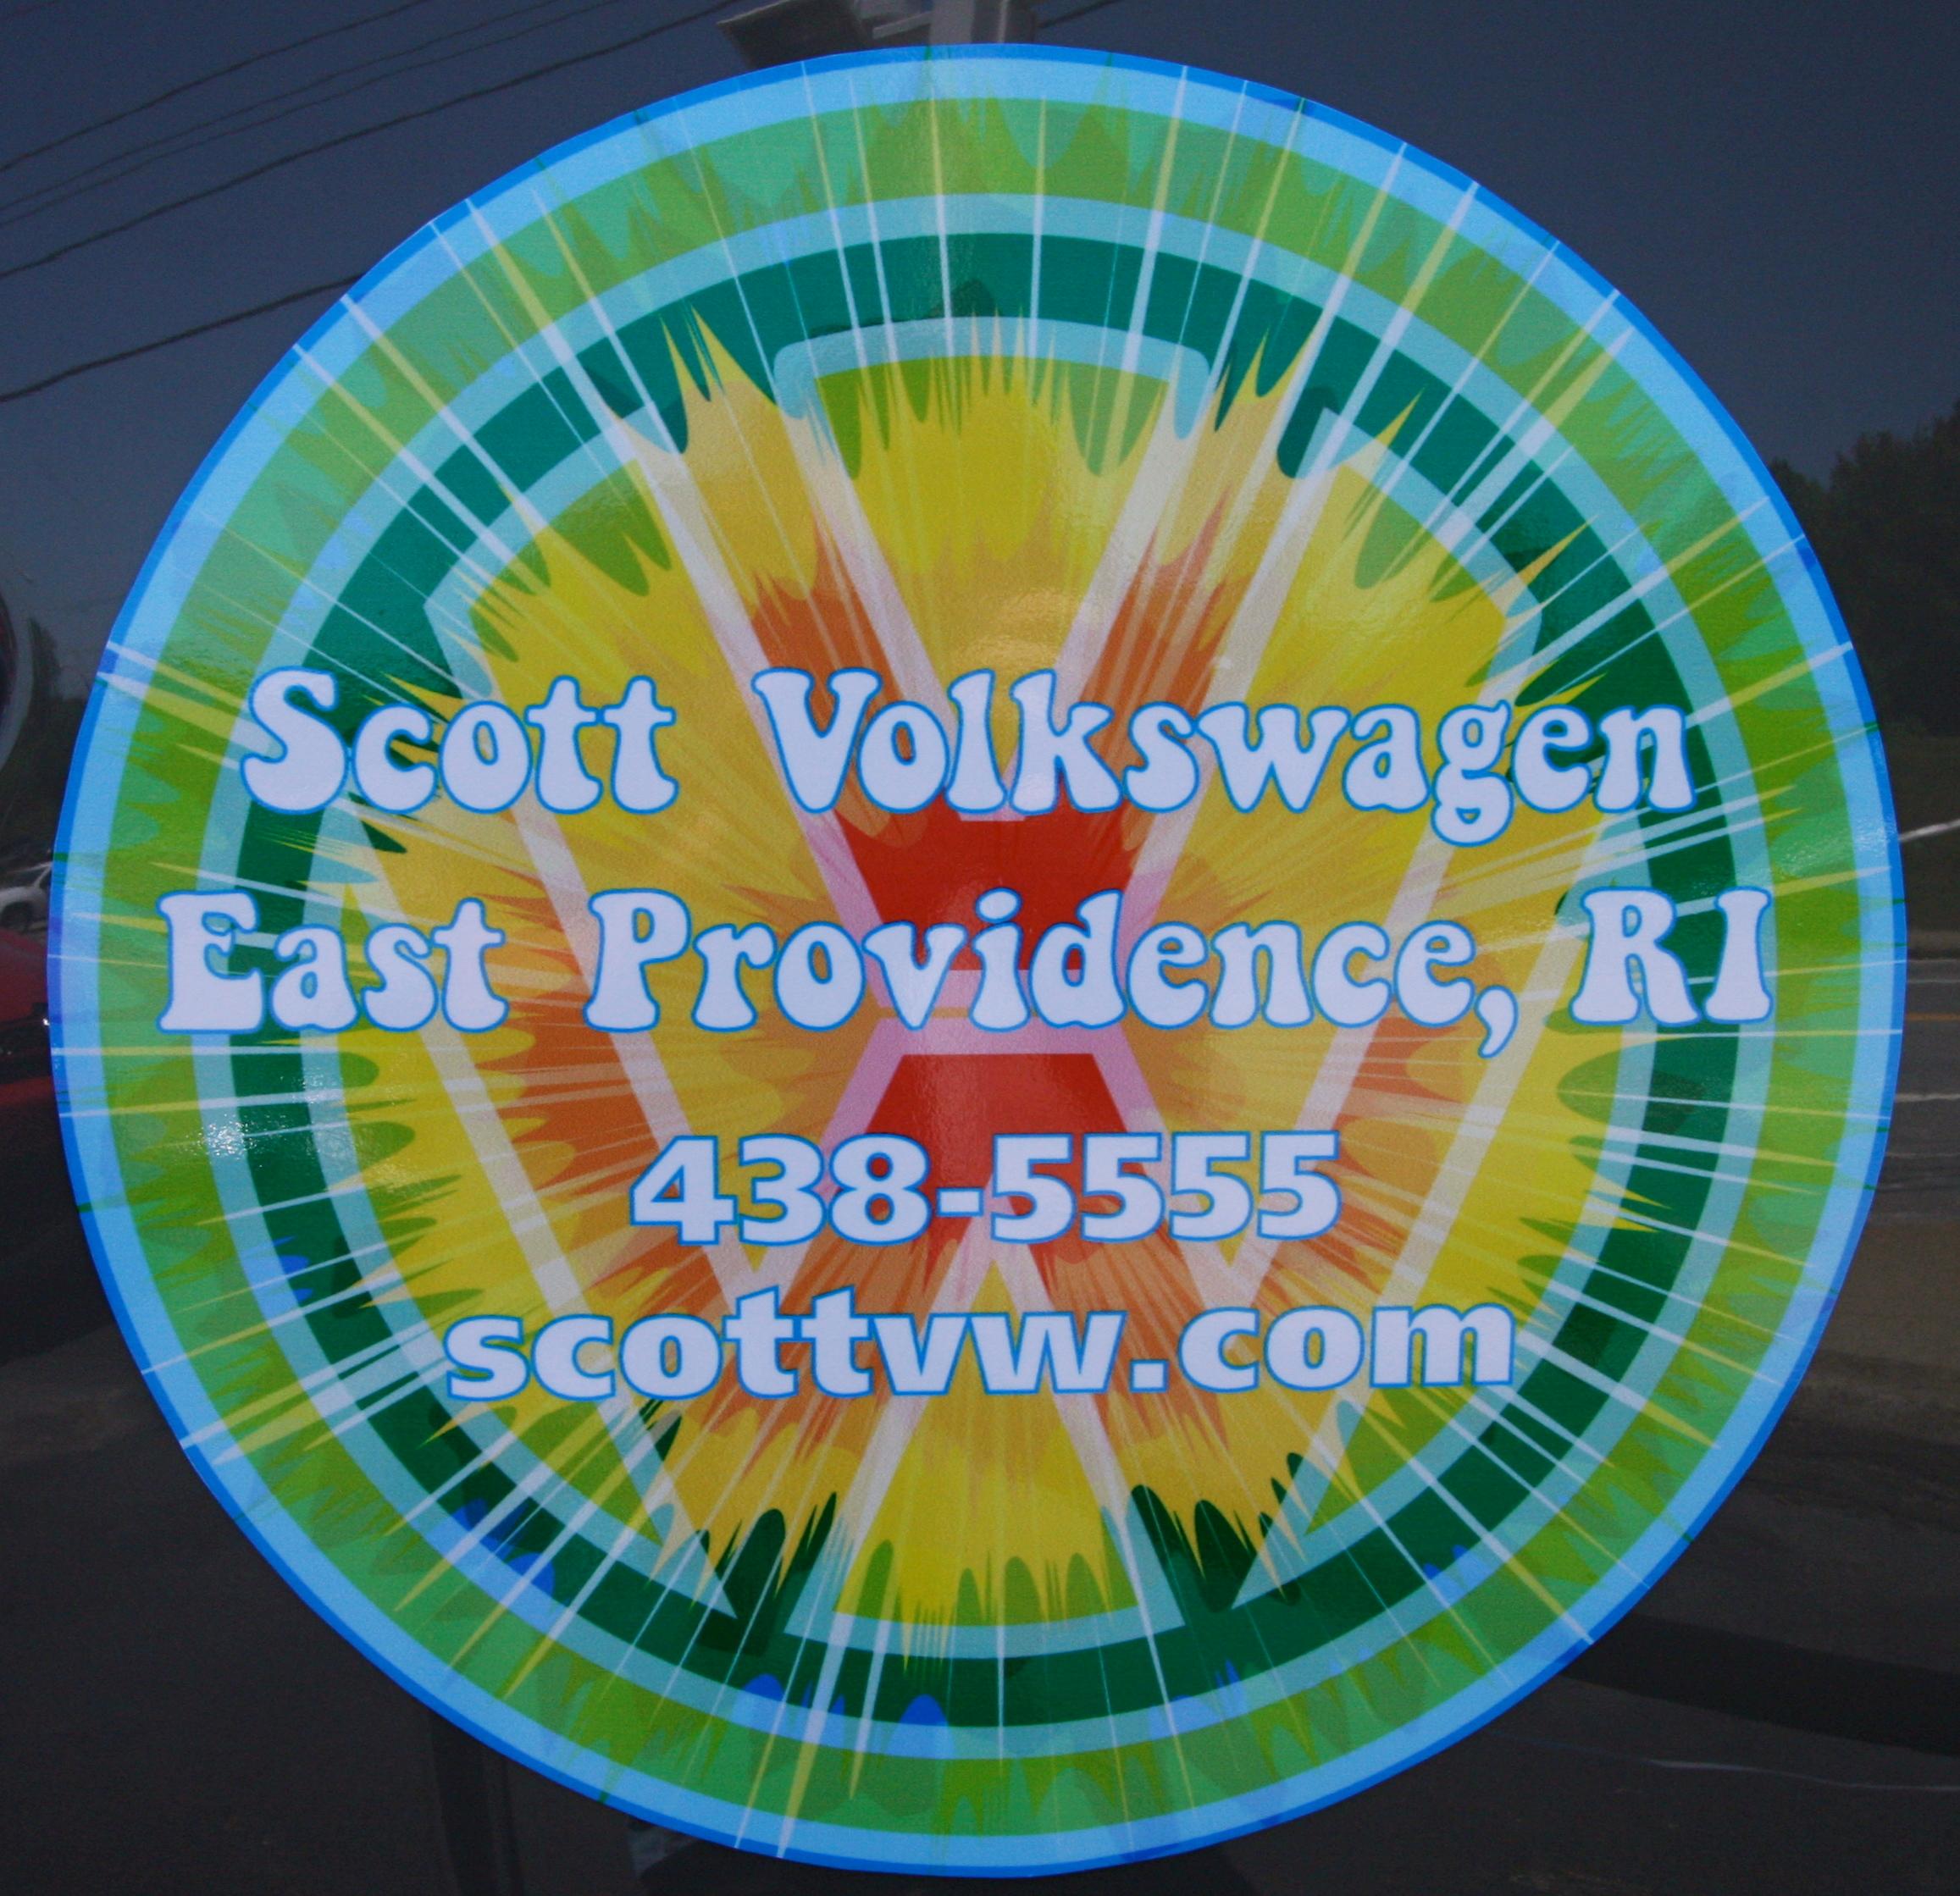 Scott Volkswagen, East Providence Rhode Island (RI